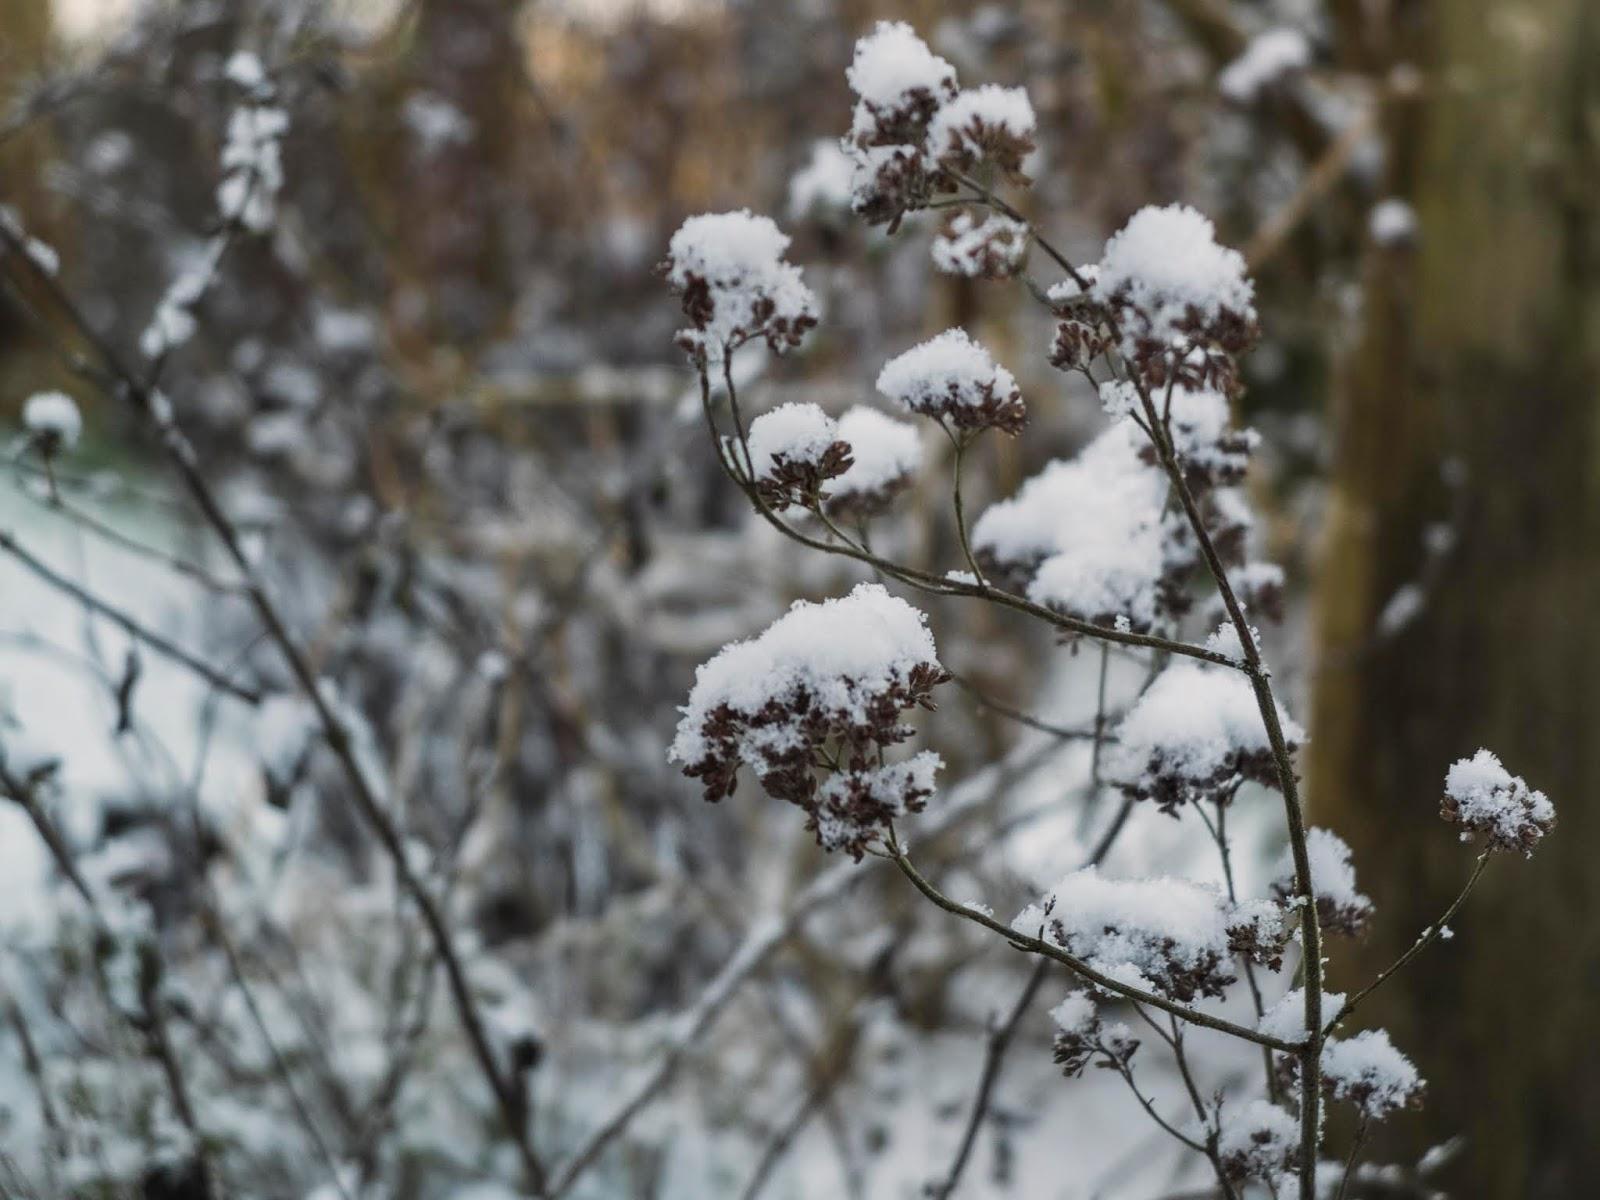 Snow capped Marjoram flower heads in the garden.